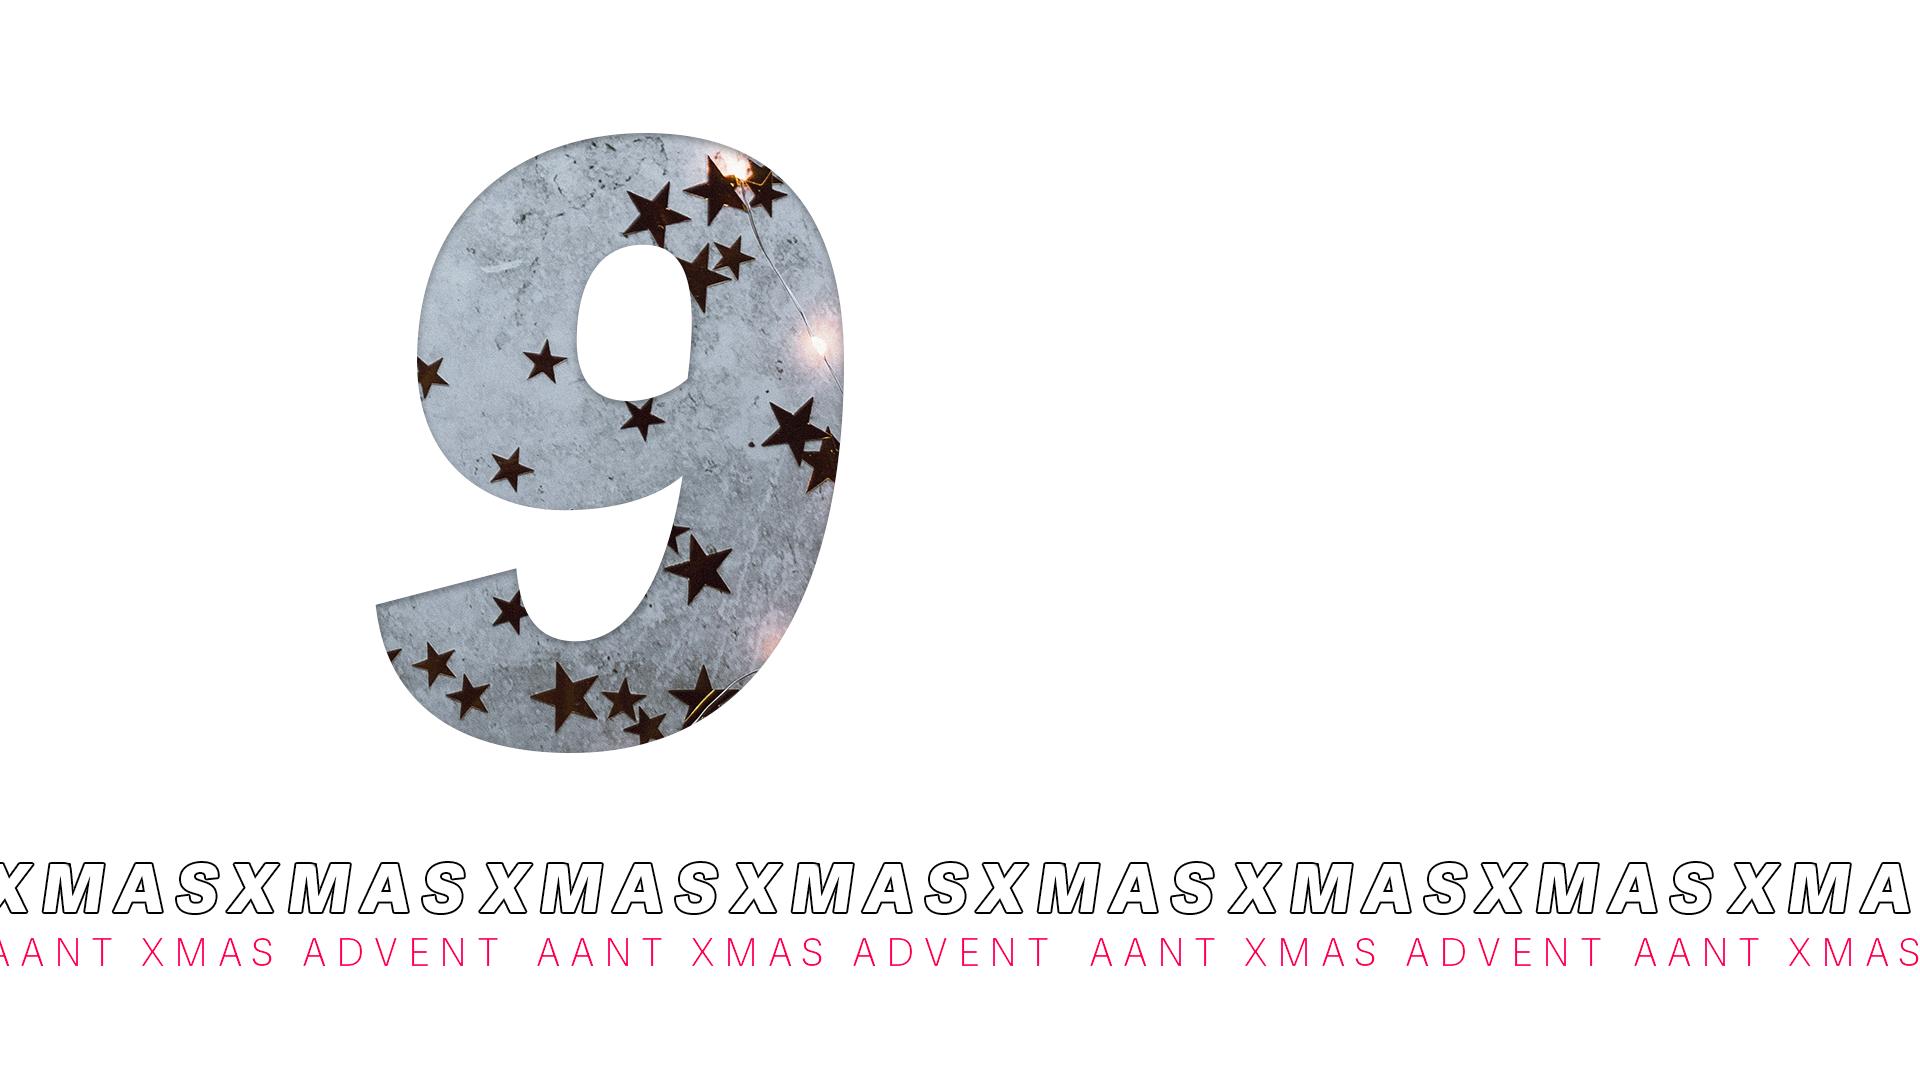 AANT XMAS ADVENT – 9 DICEMBRE